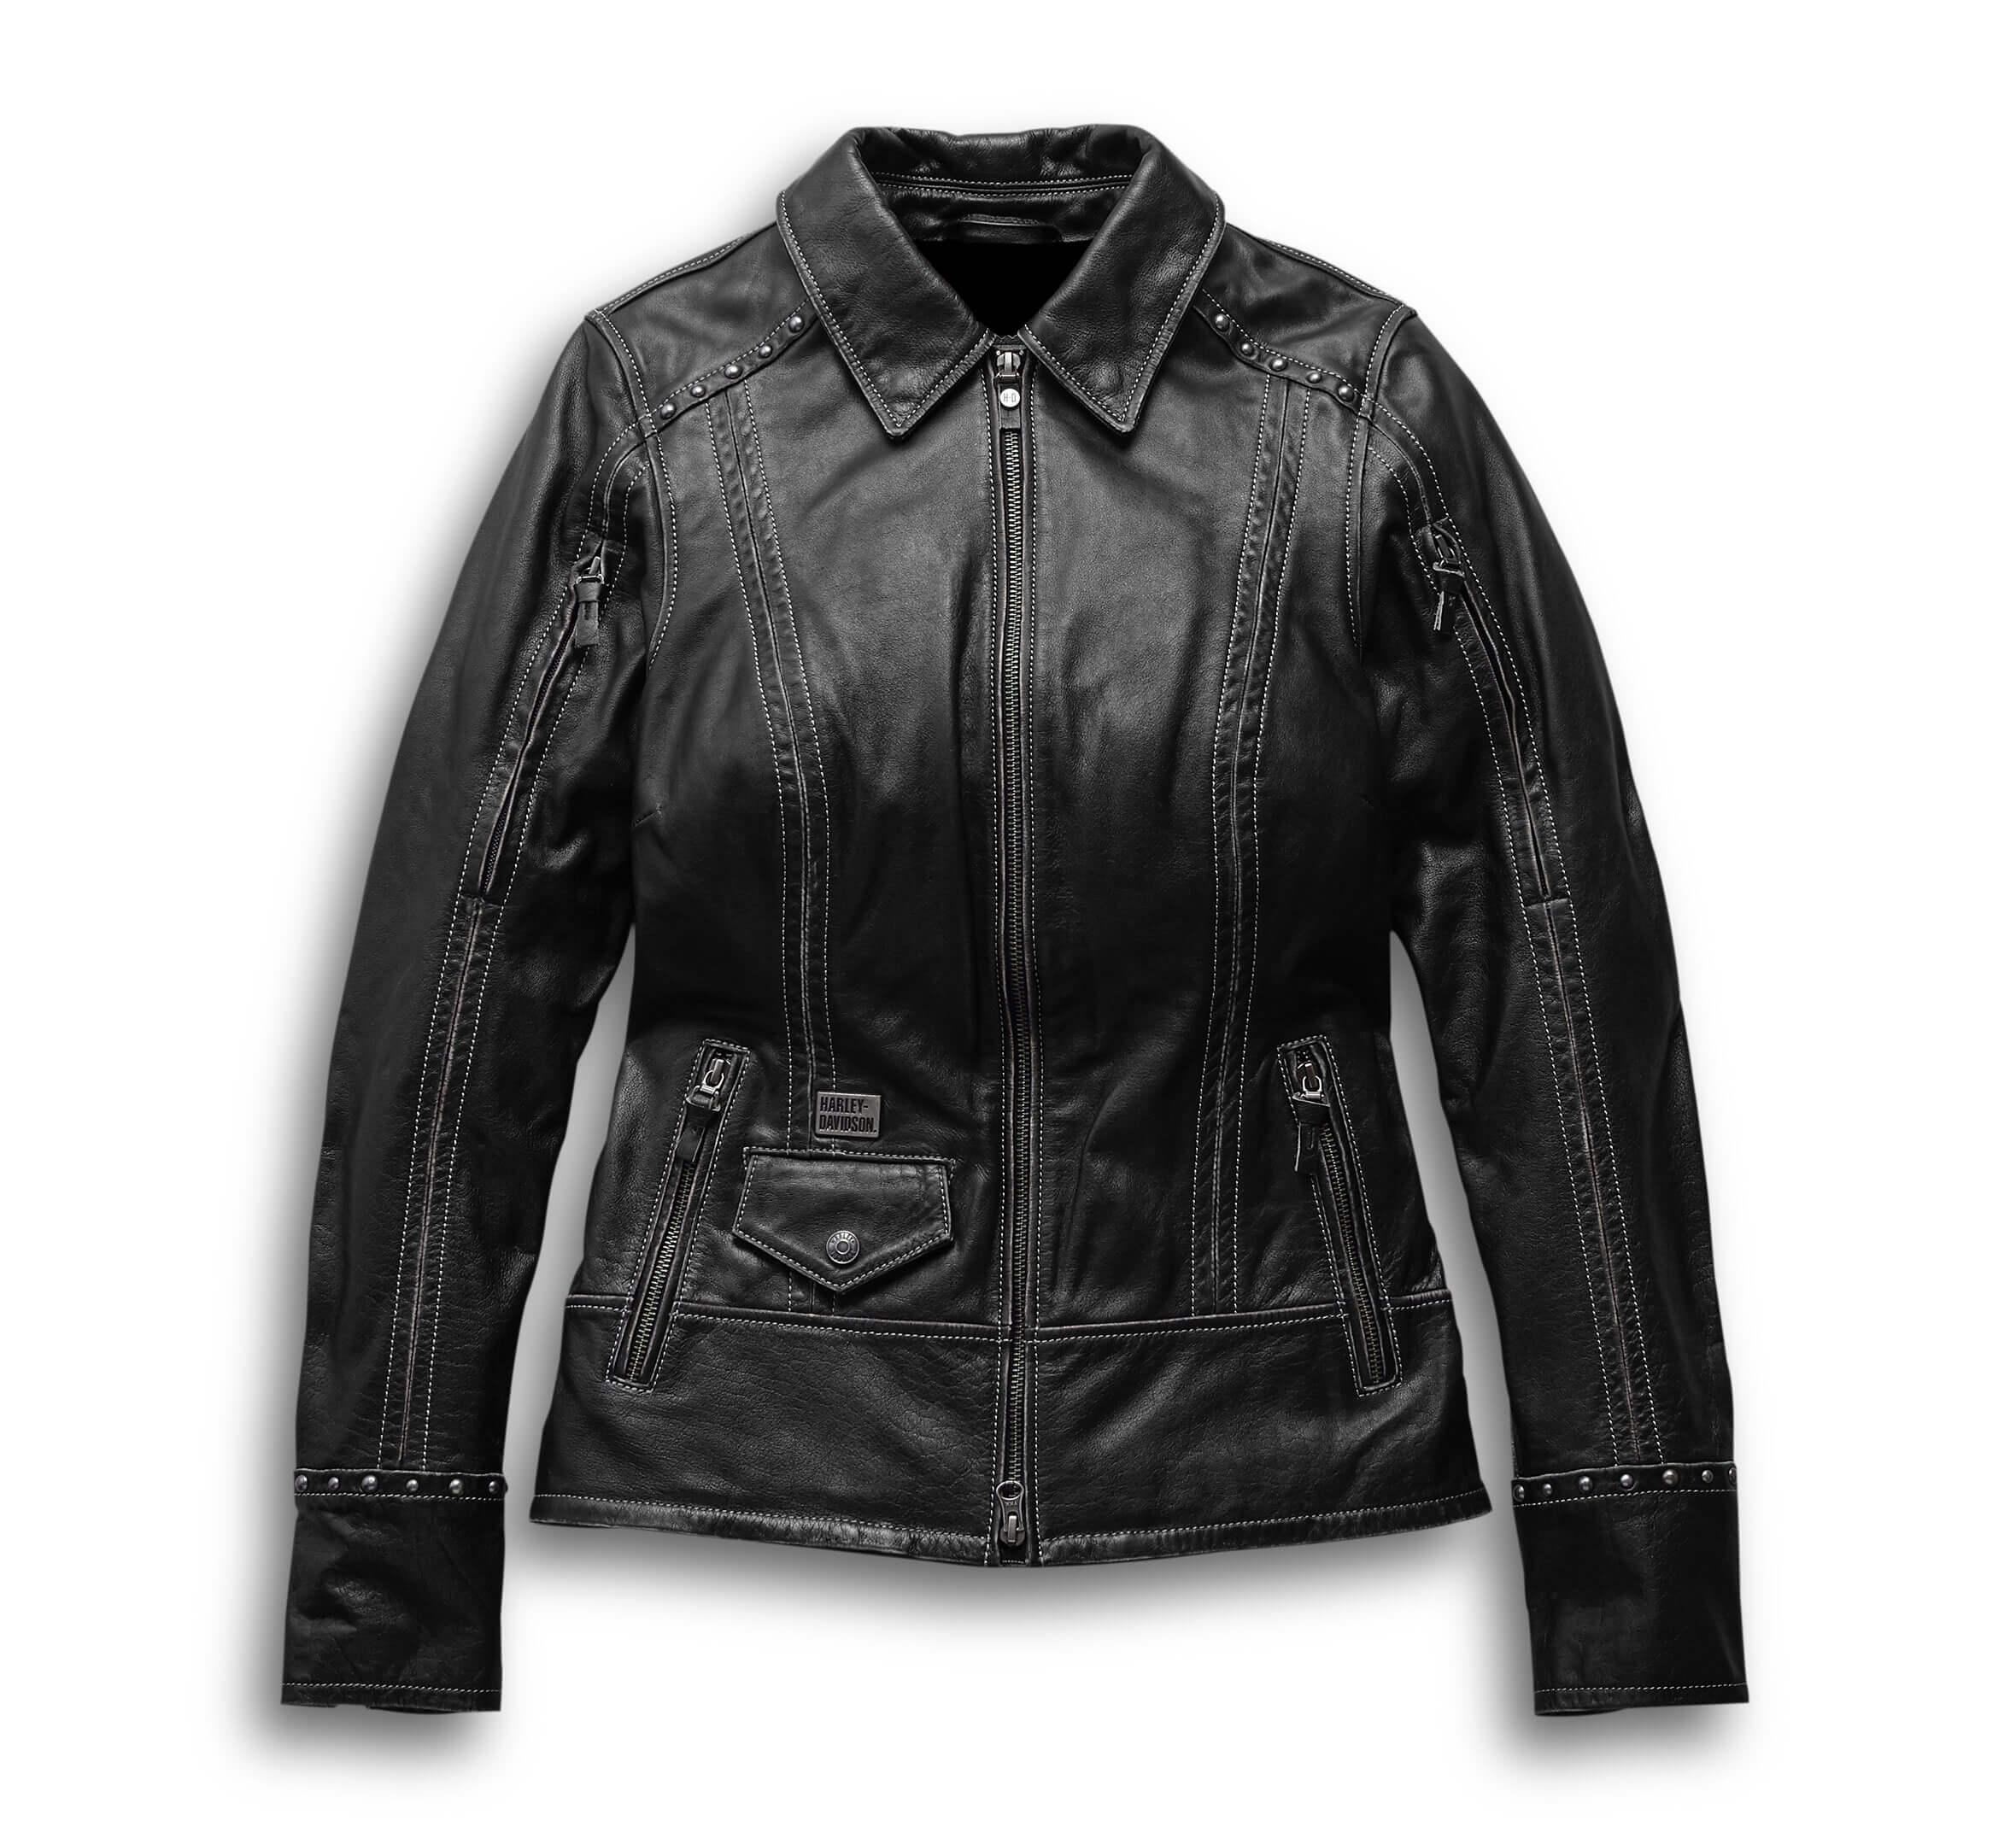 Harley Davidson Motorcycle Black Leather Jacket